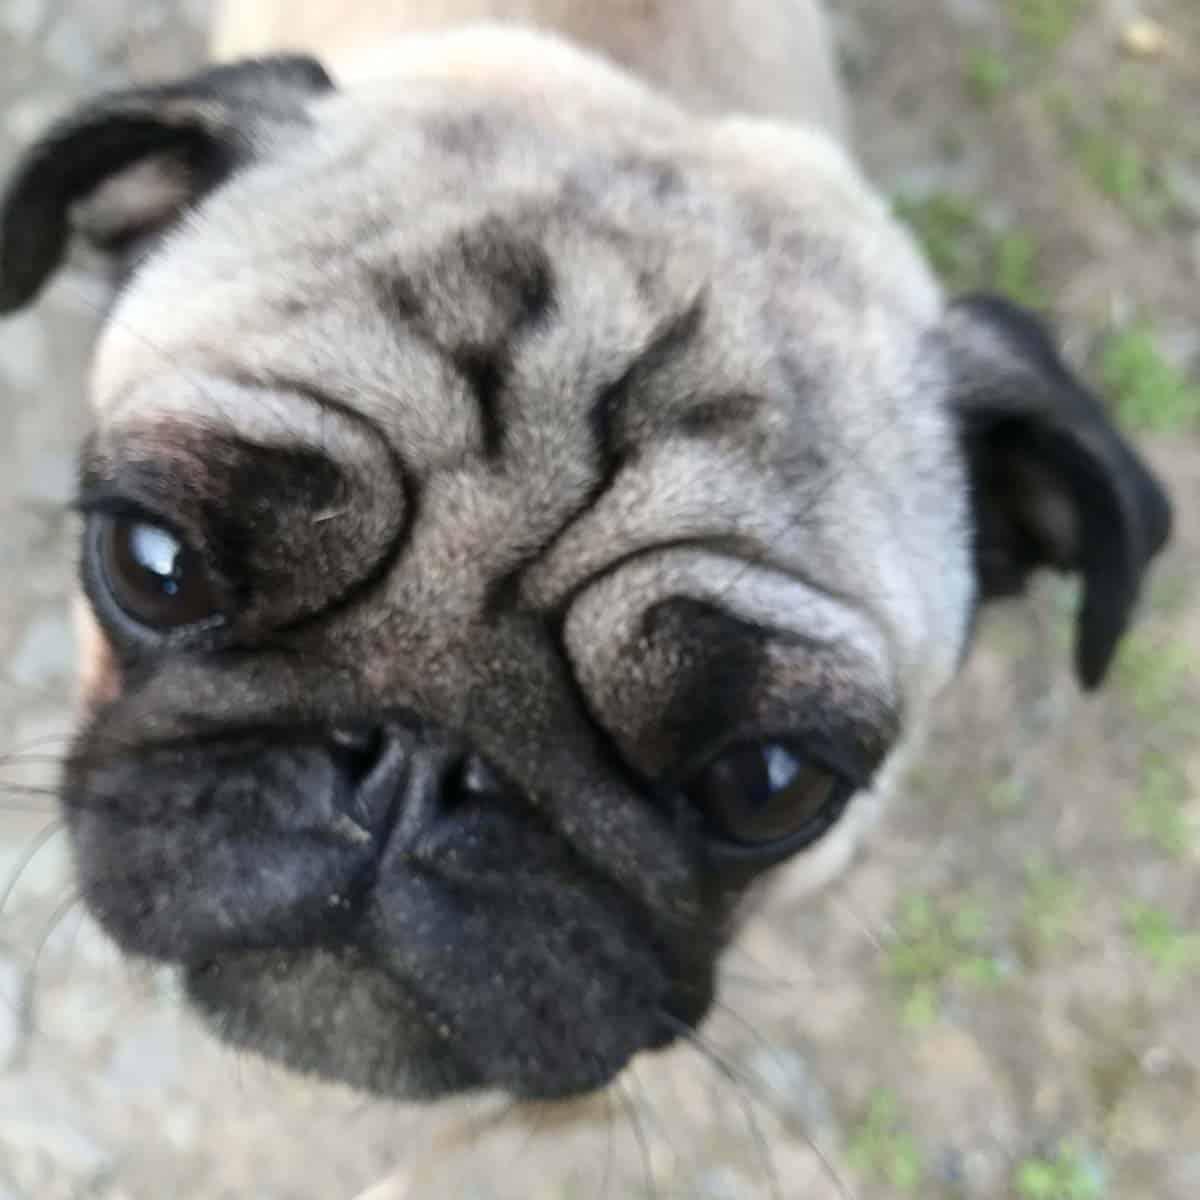 Missy the pug